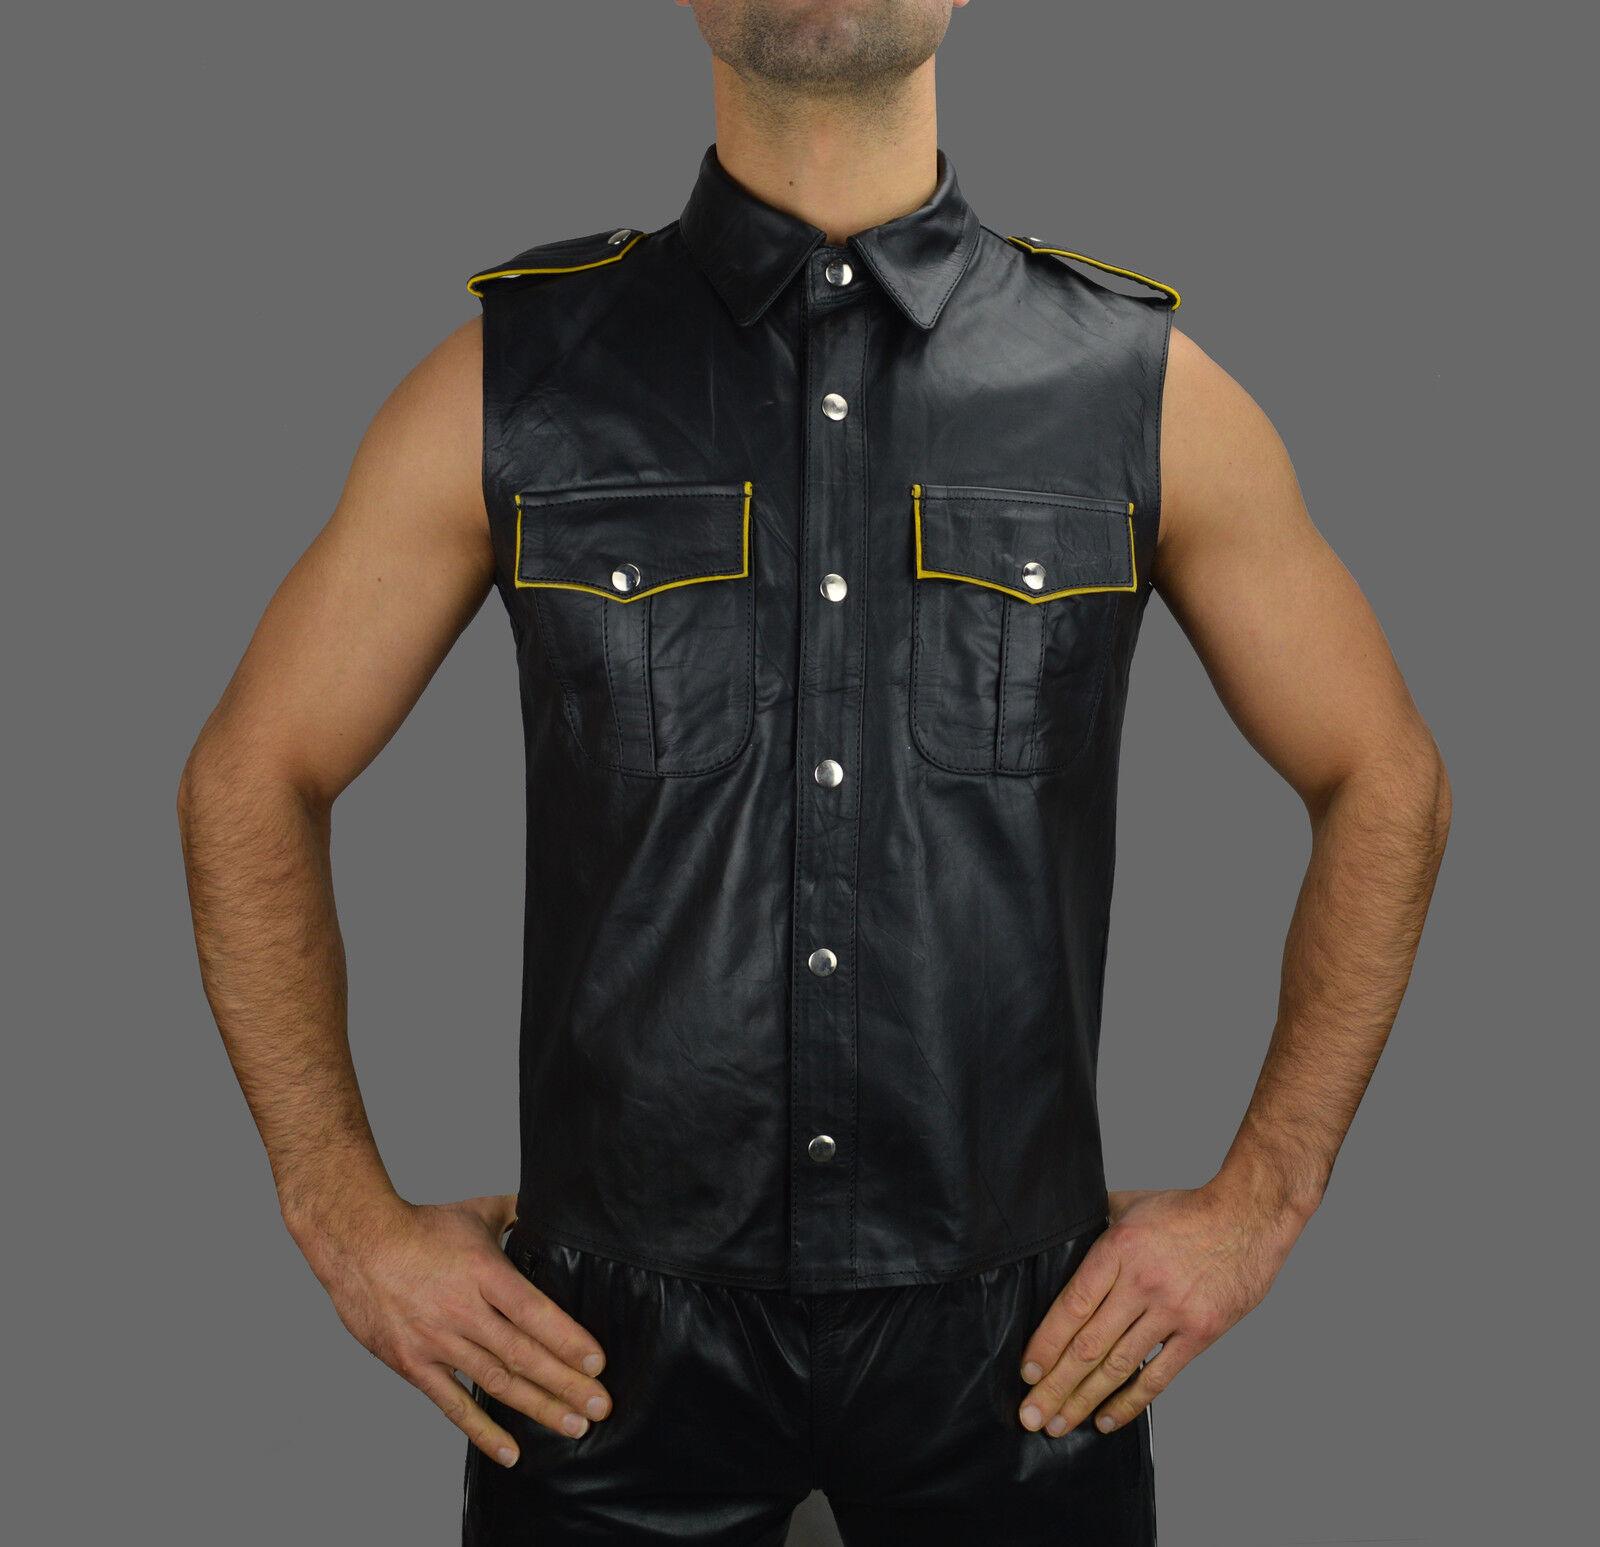 Lederhemd mit yellowen Biesen Leather shirt,Chemise Cuir,Napa Leder Hemd weste M